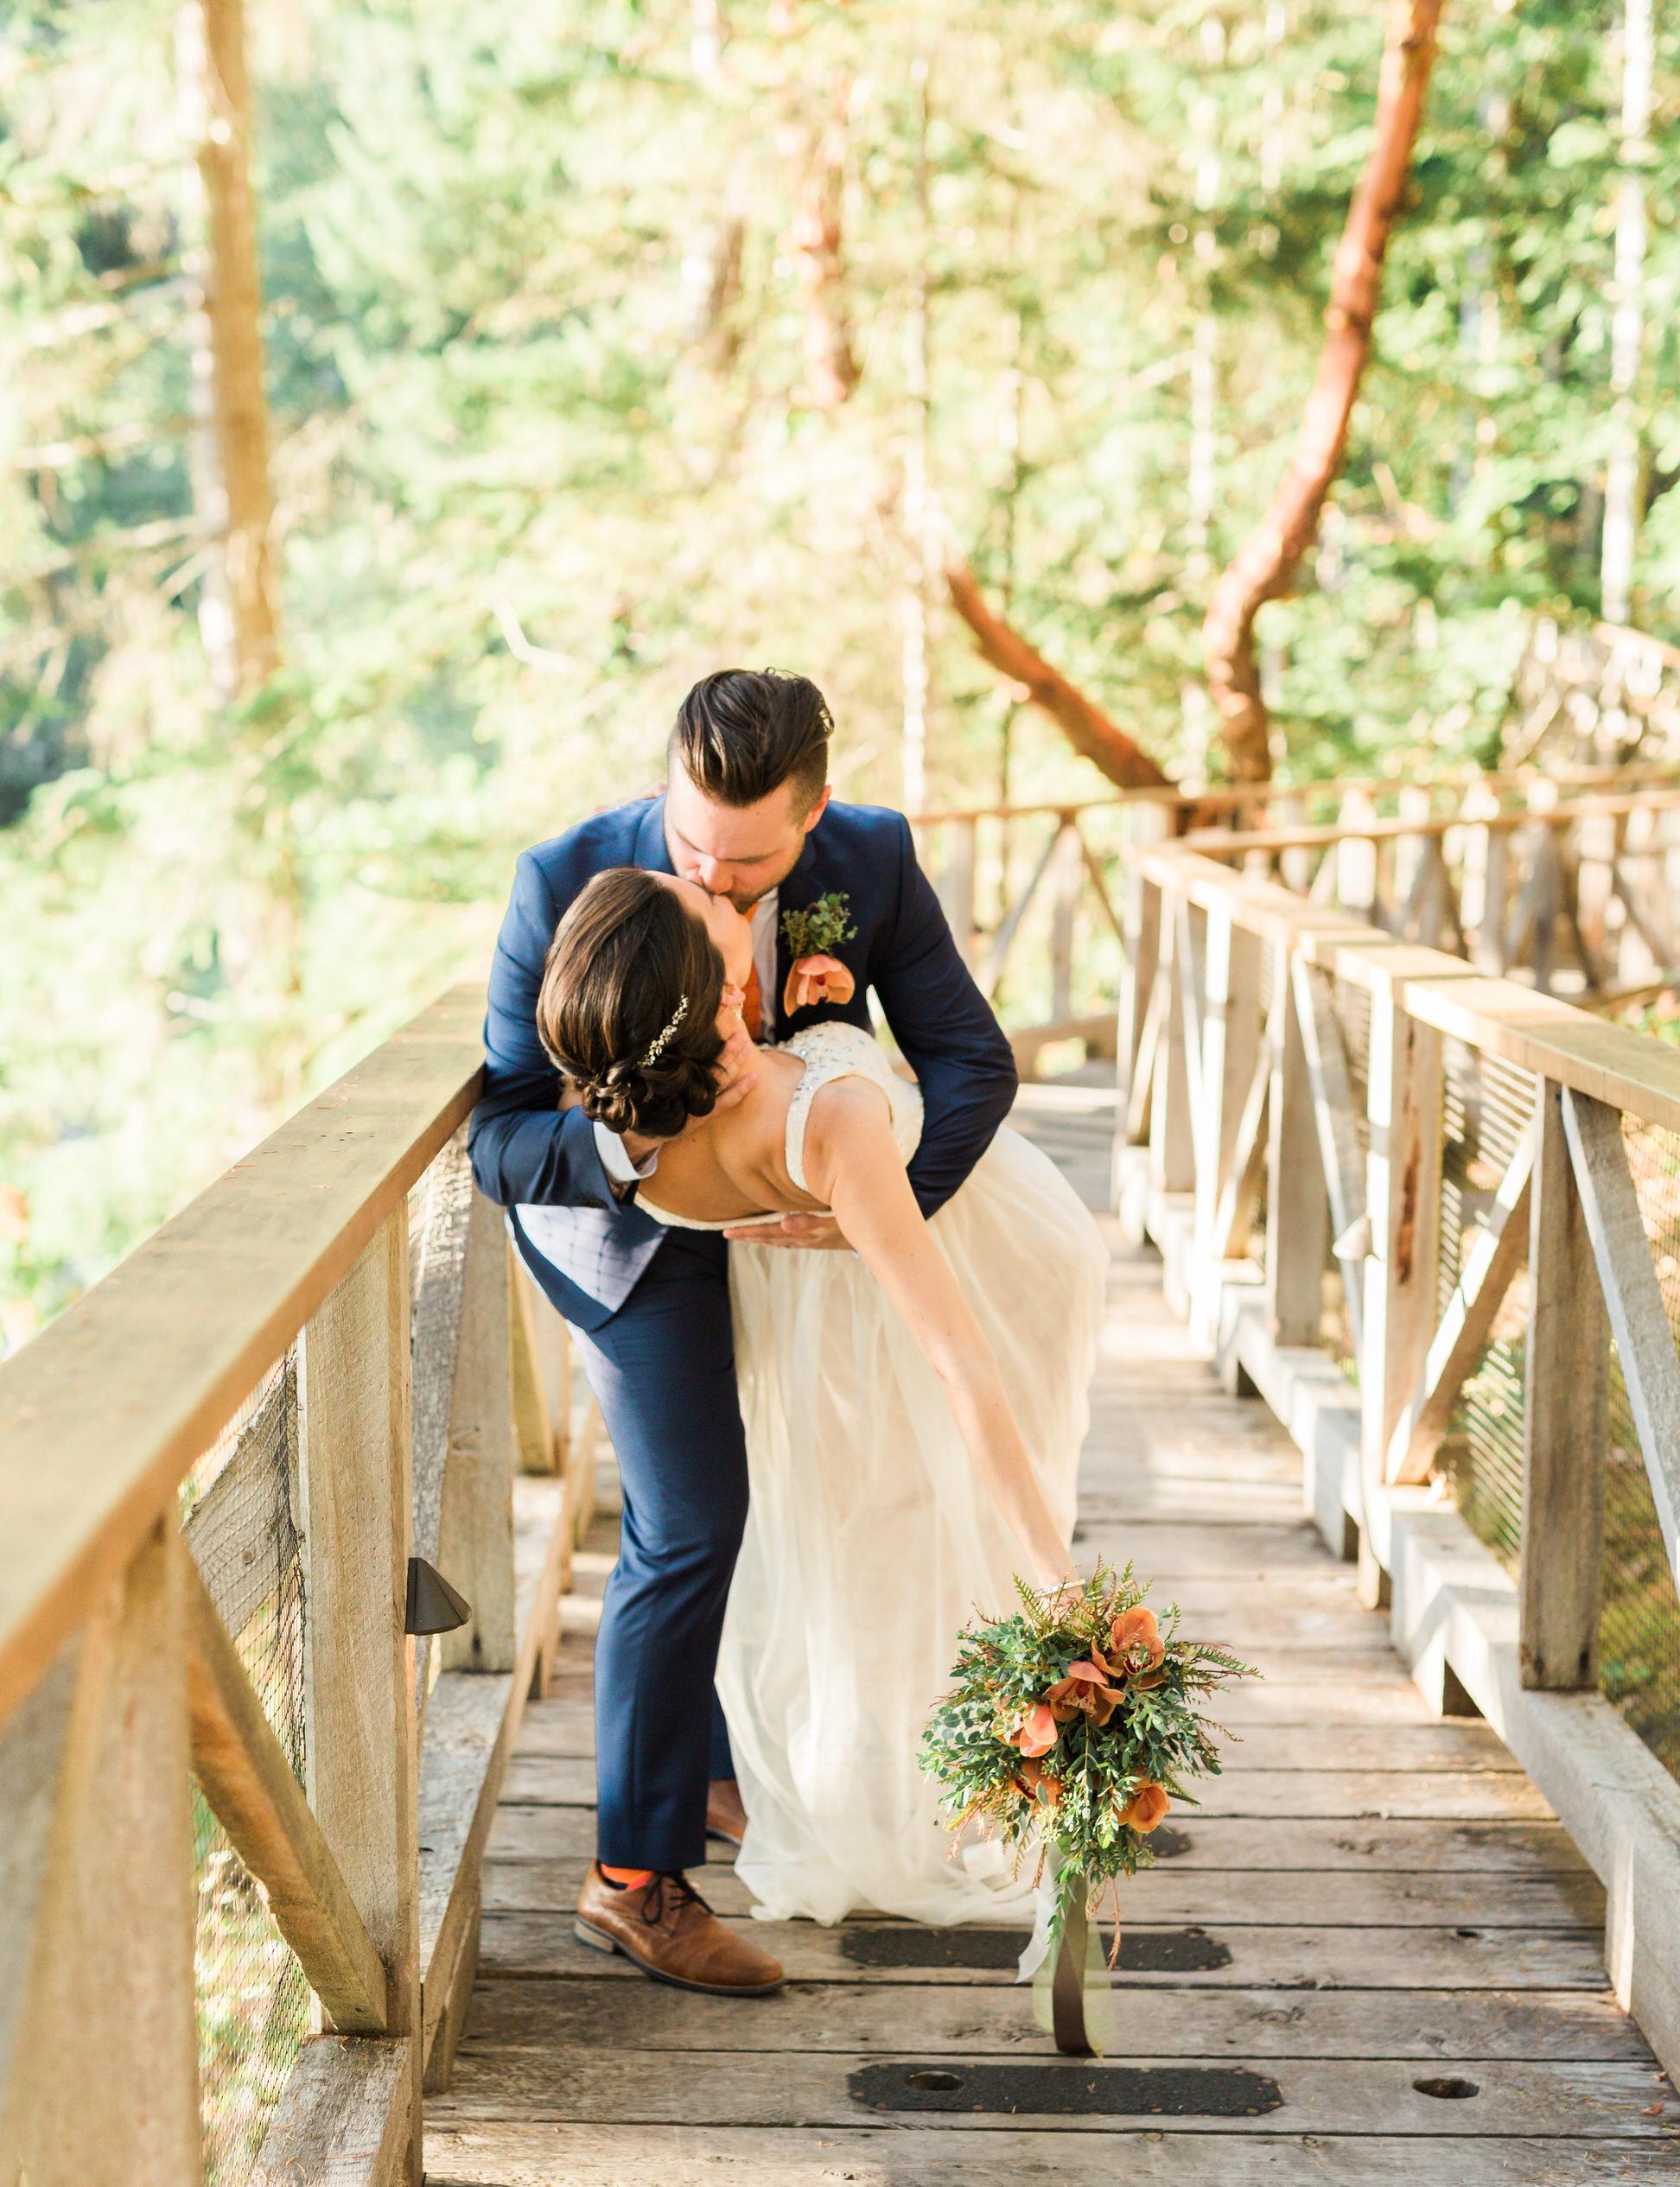 Rockwater Secret Cove Resort Wedding - Sunshine Coast BC Wedding Photographer - Vancouver Wedding Photographer - Sunshine Coast Elopement Photos - IMG_0856.jpg